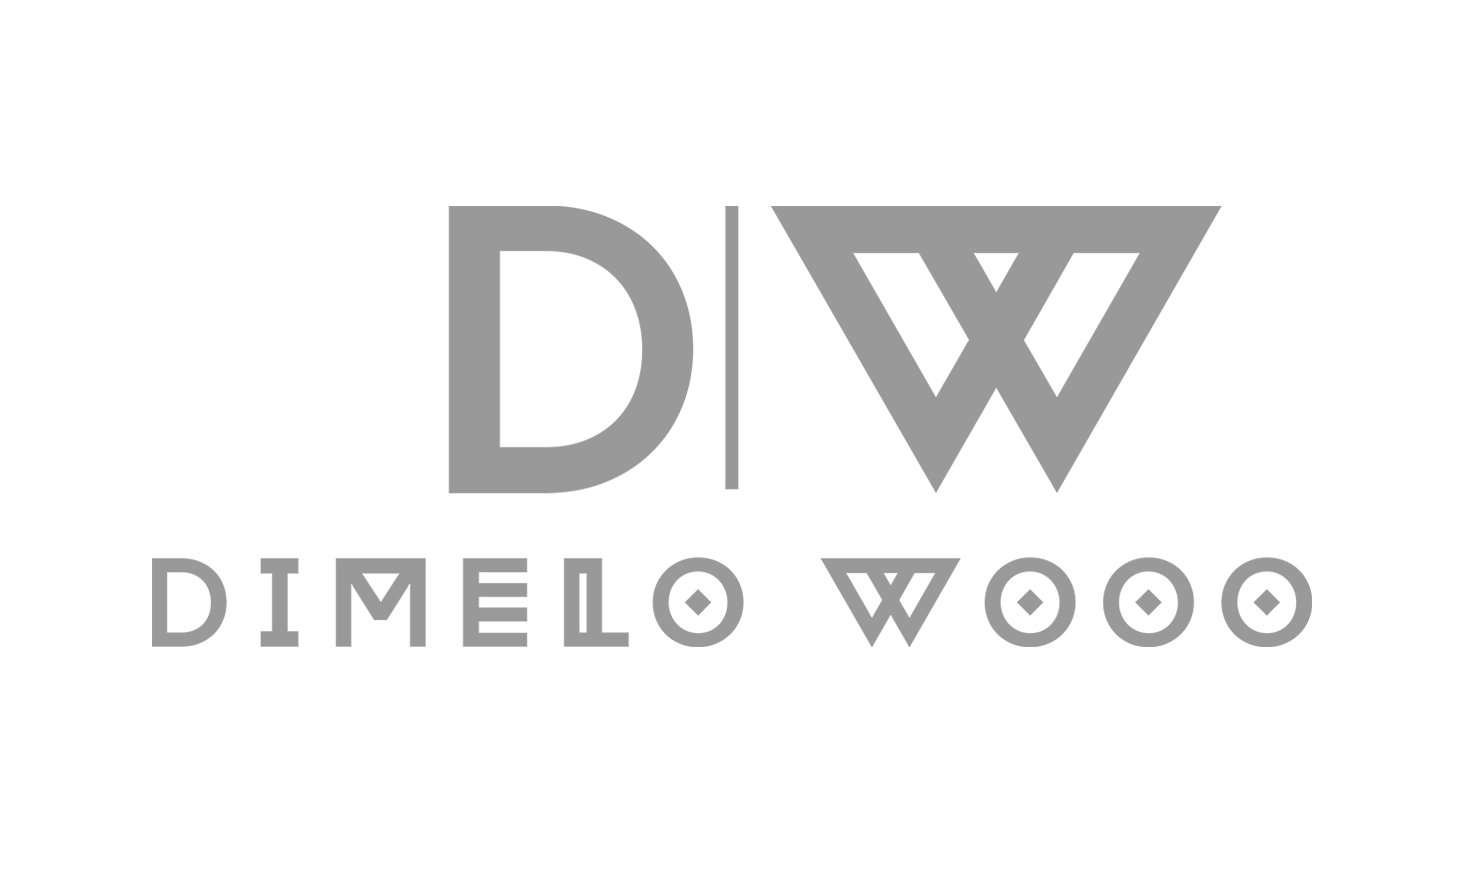 Dimelo Wooo